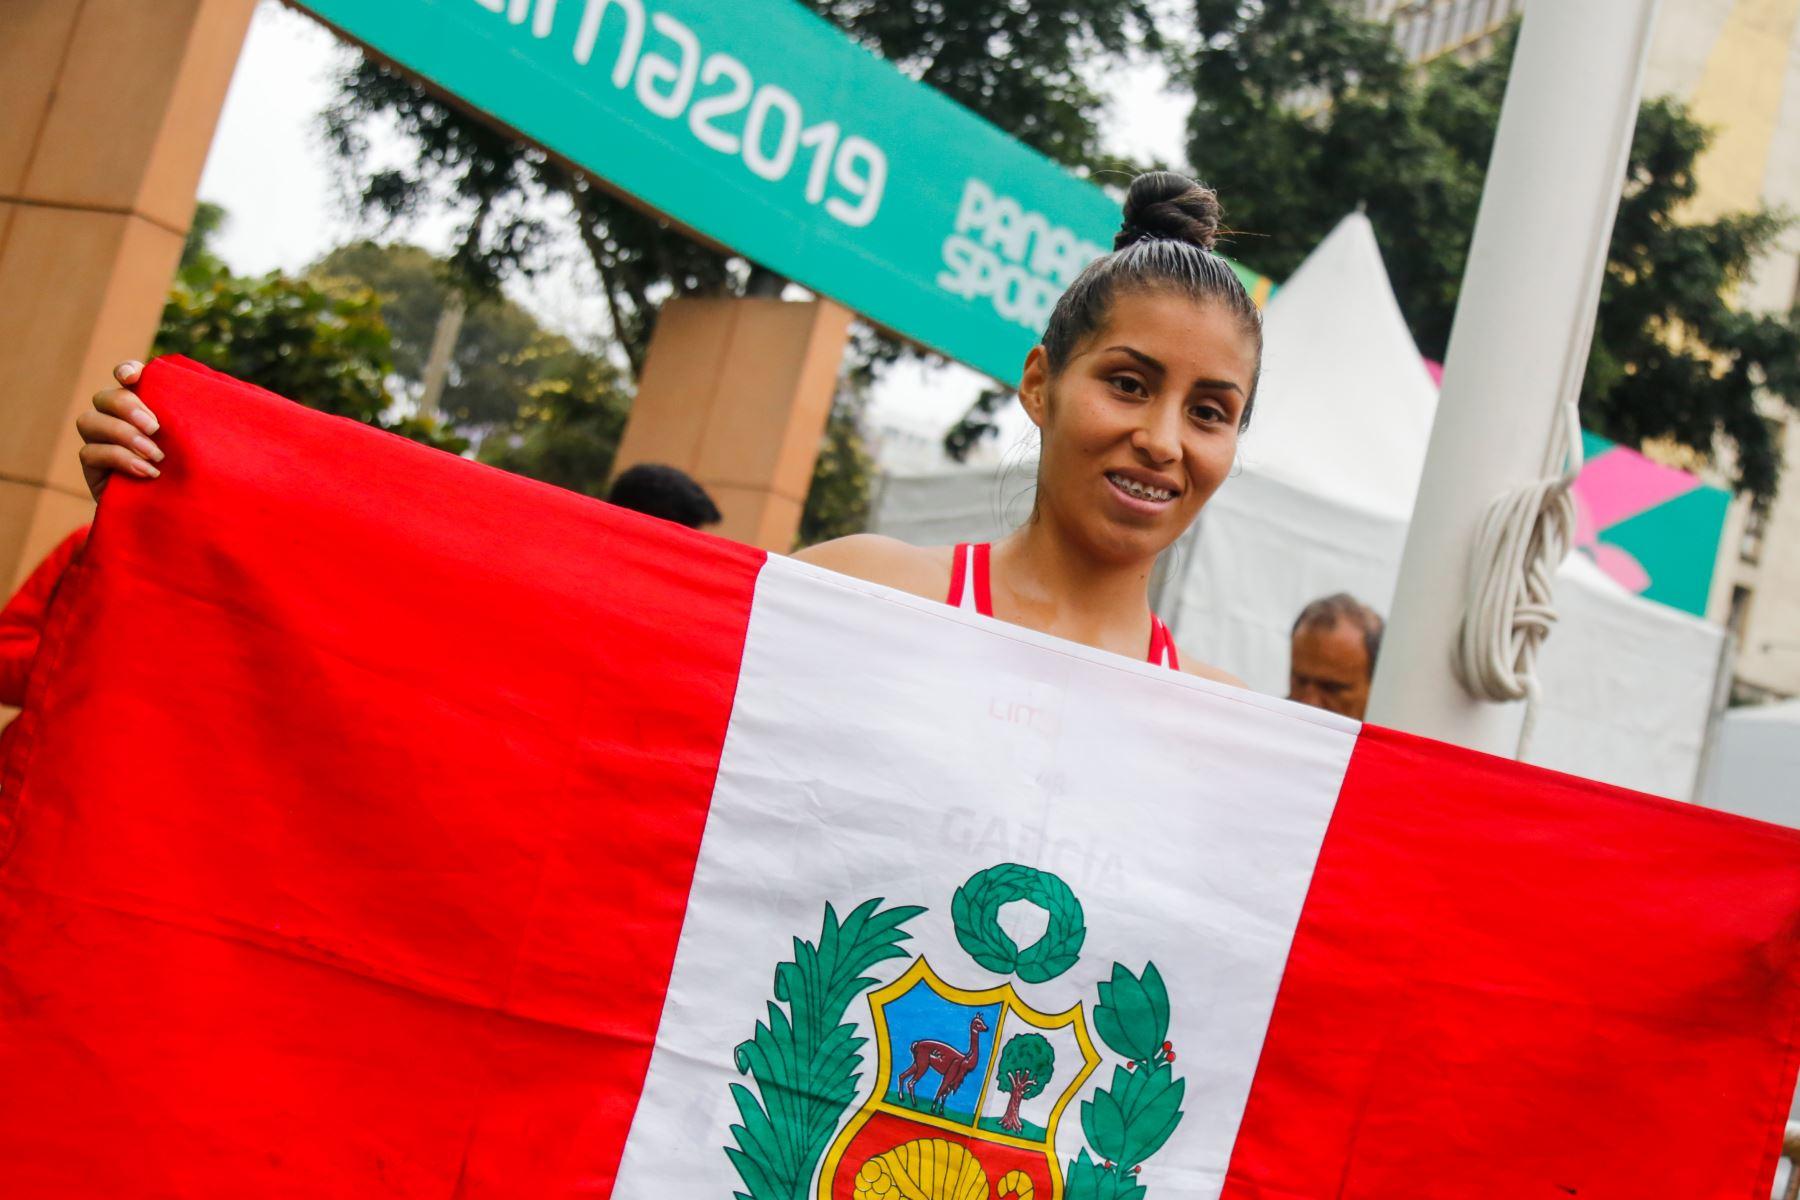 Kimberly García gana medalla de plata en Marcha Femenina 20K. Foto: AFP